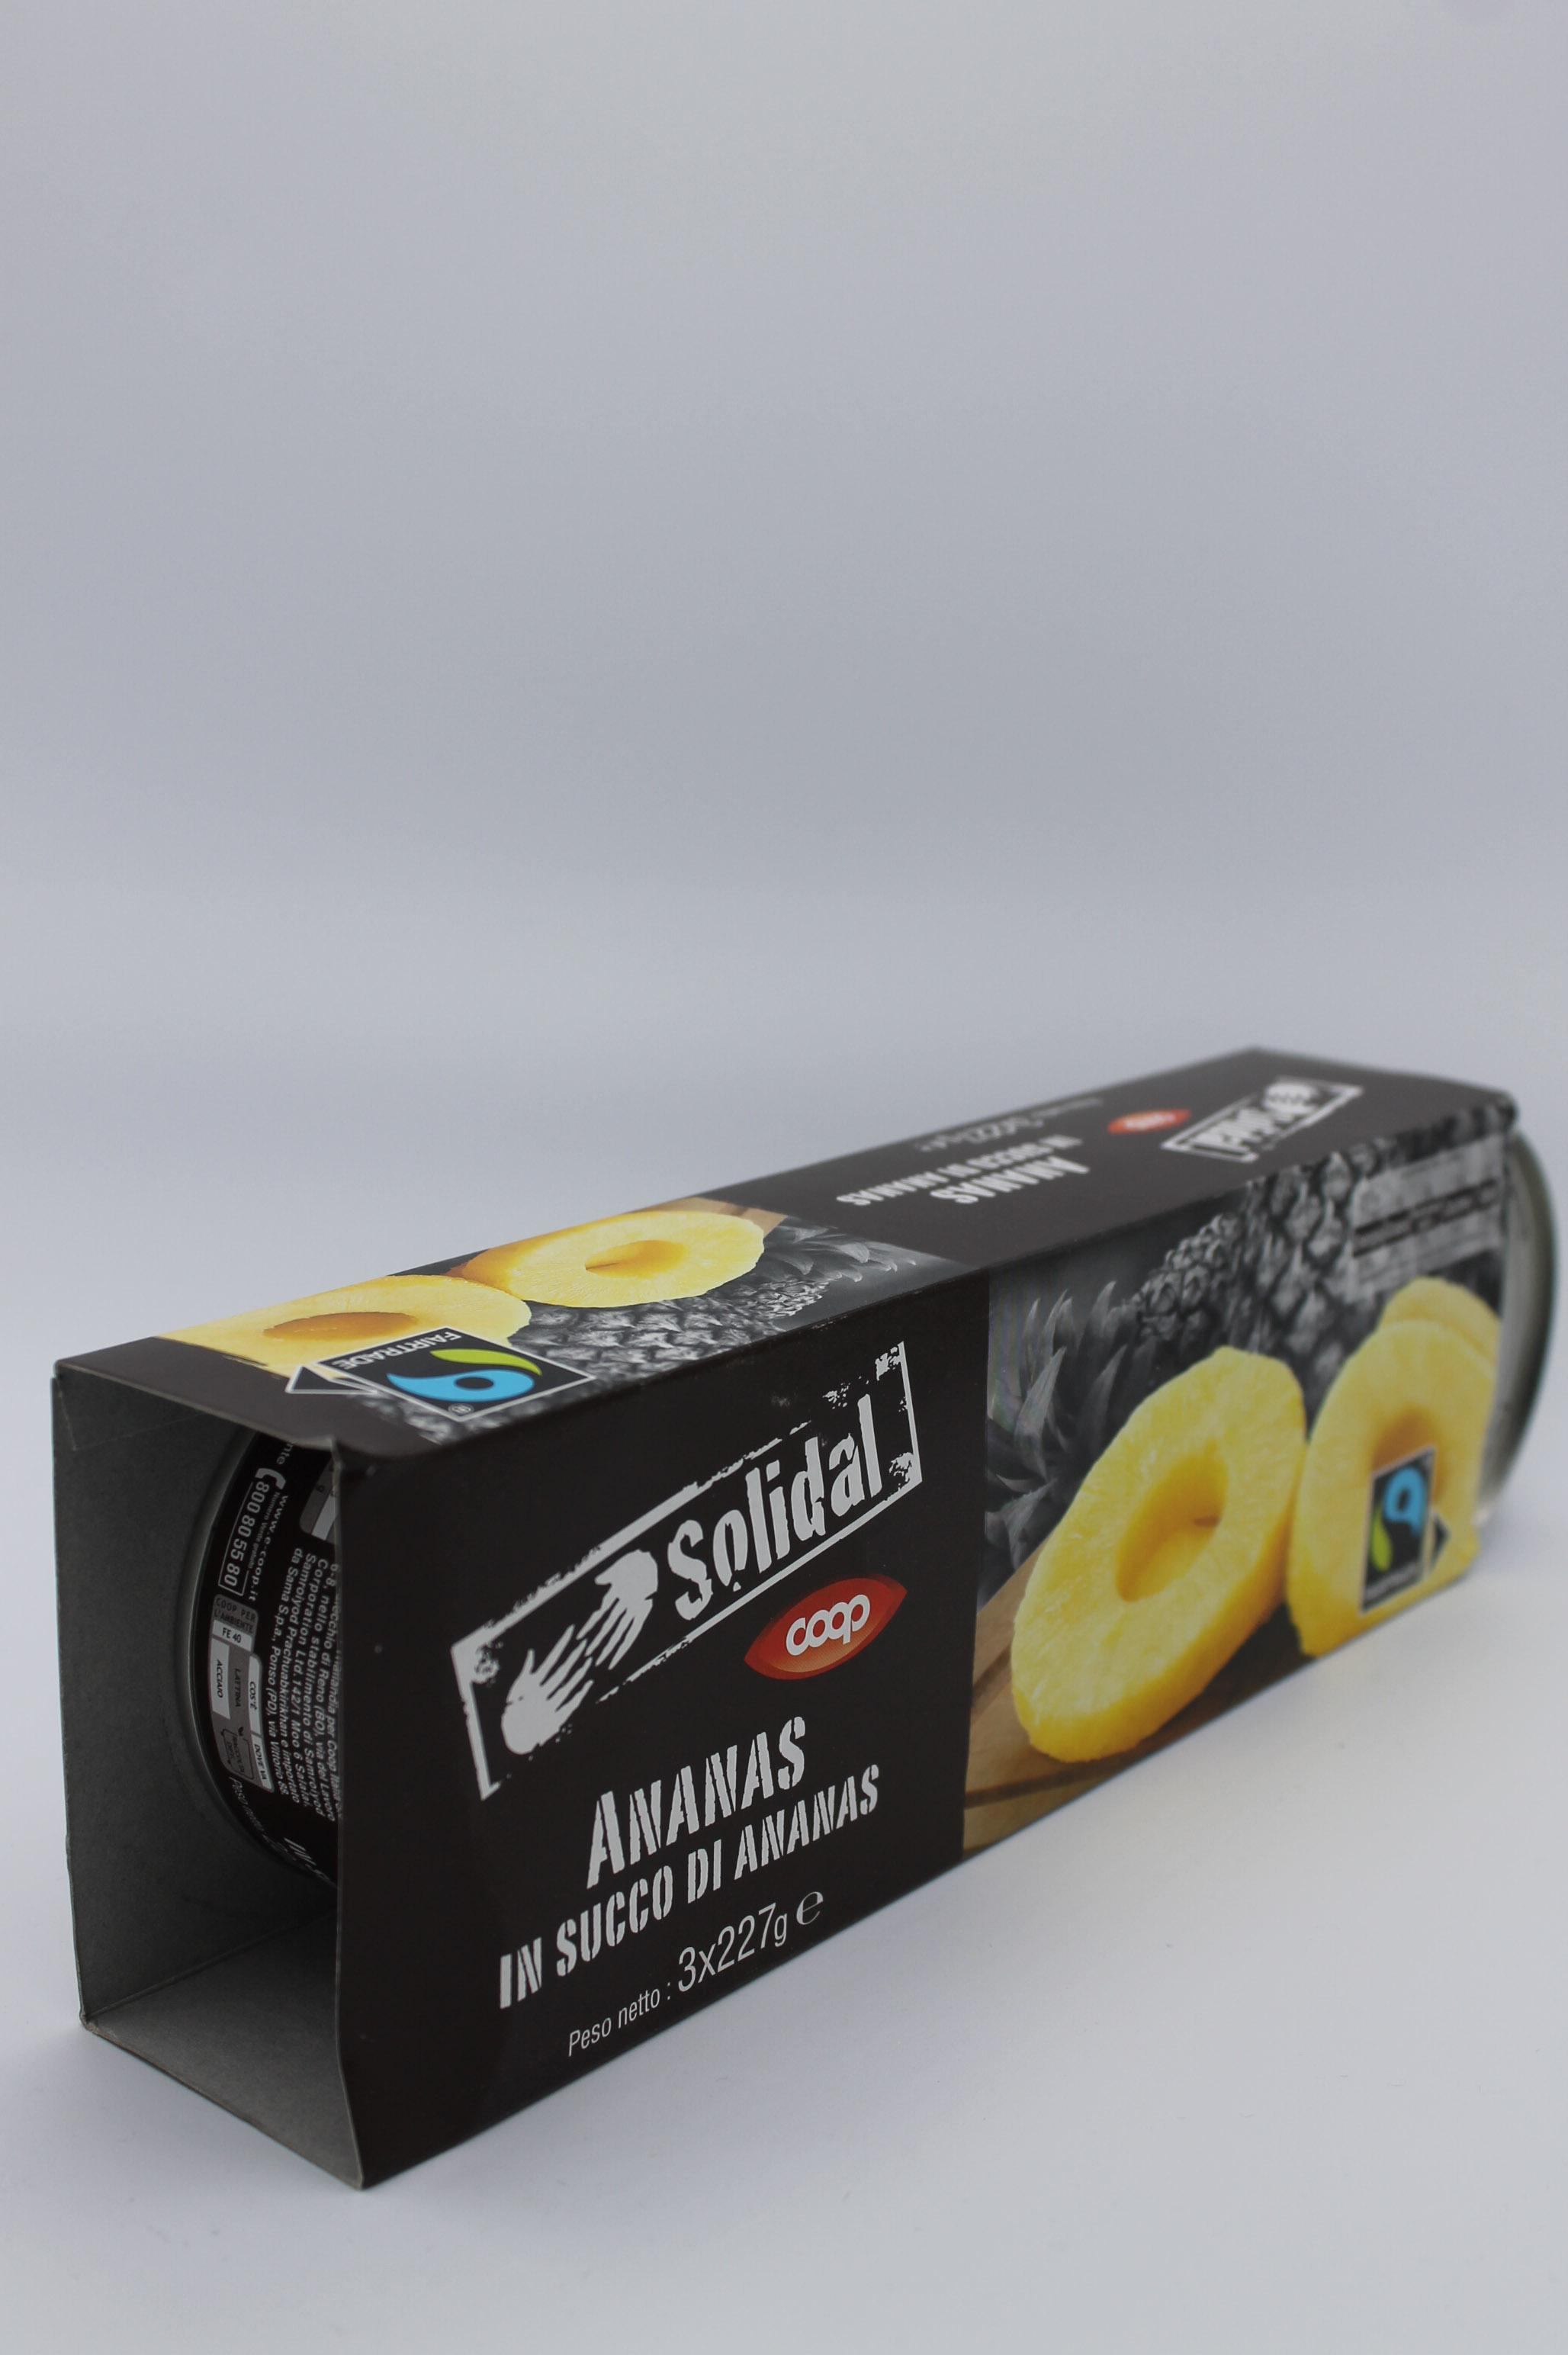 Fettine ananas in succo di ananas 3X140gr.